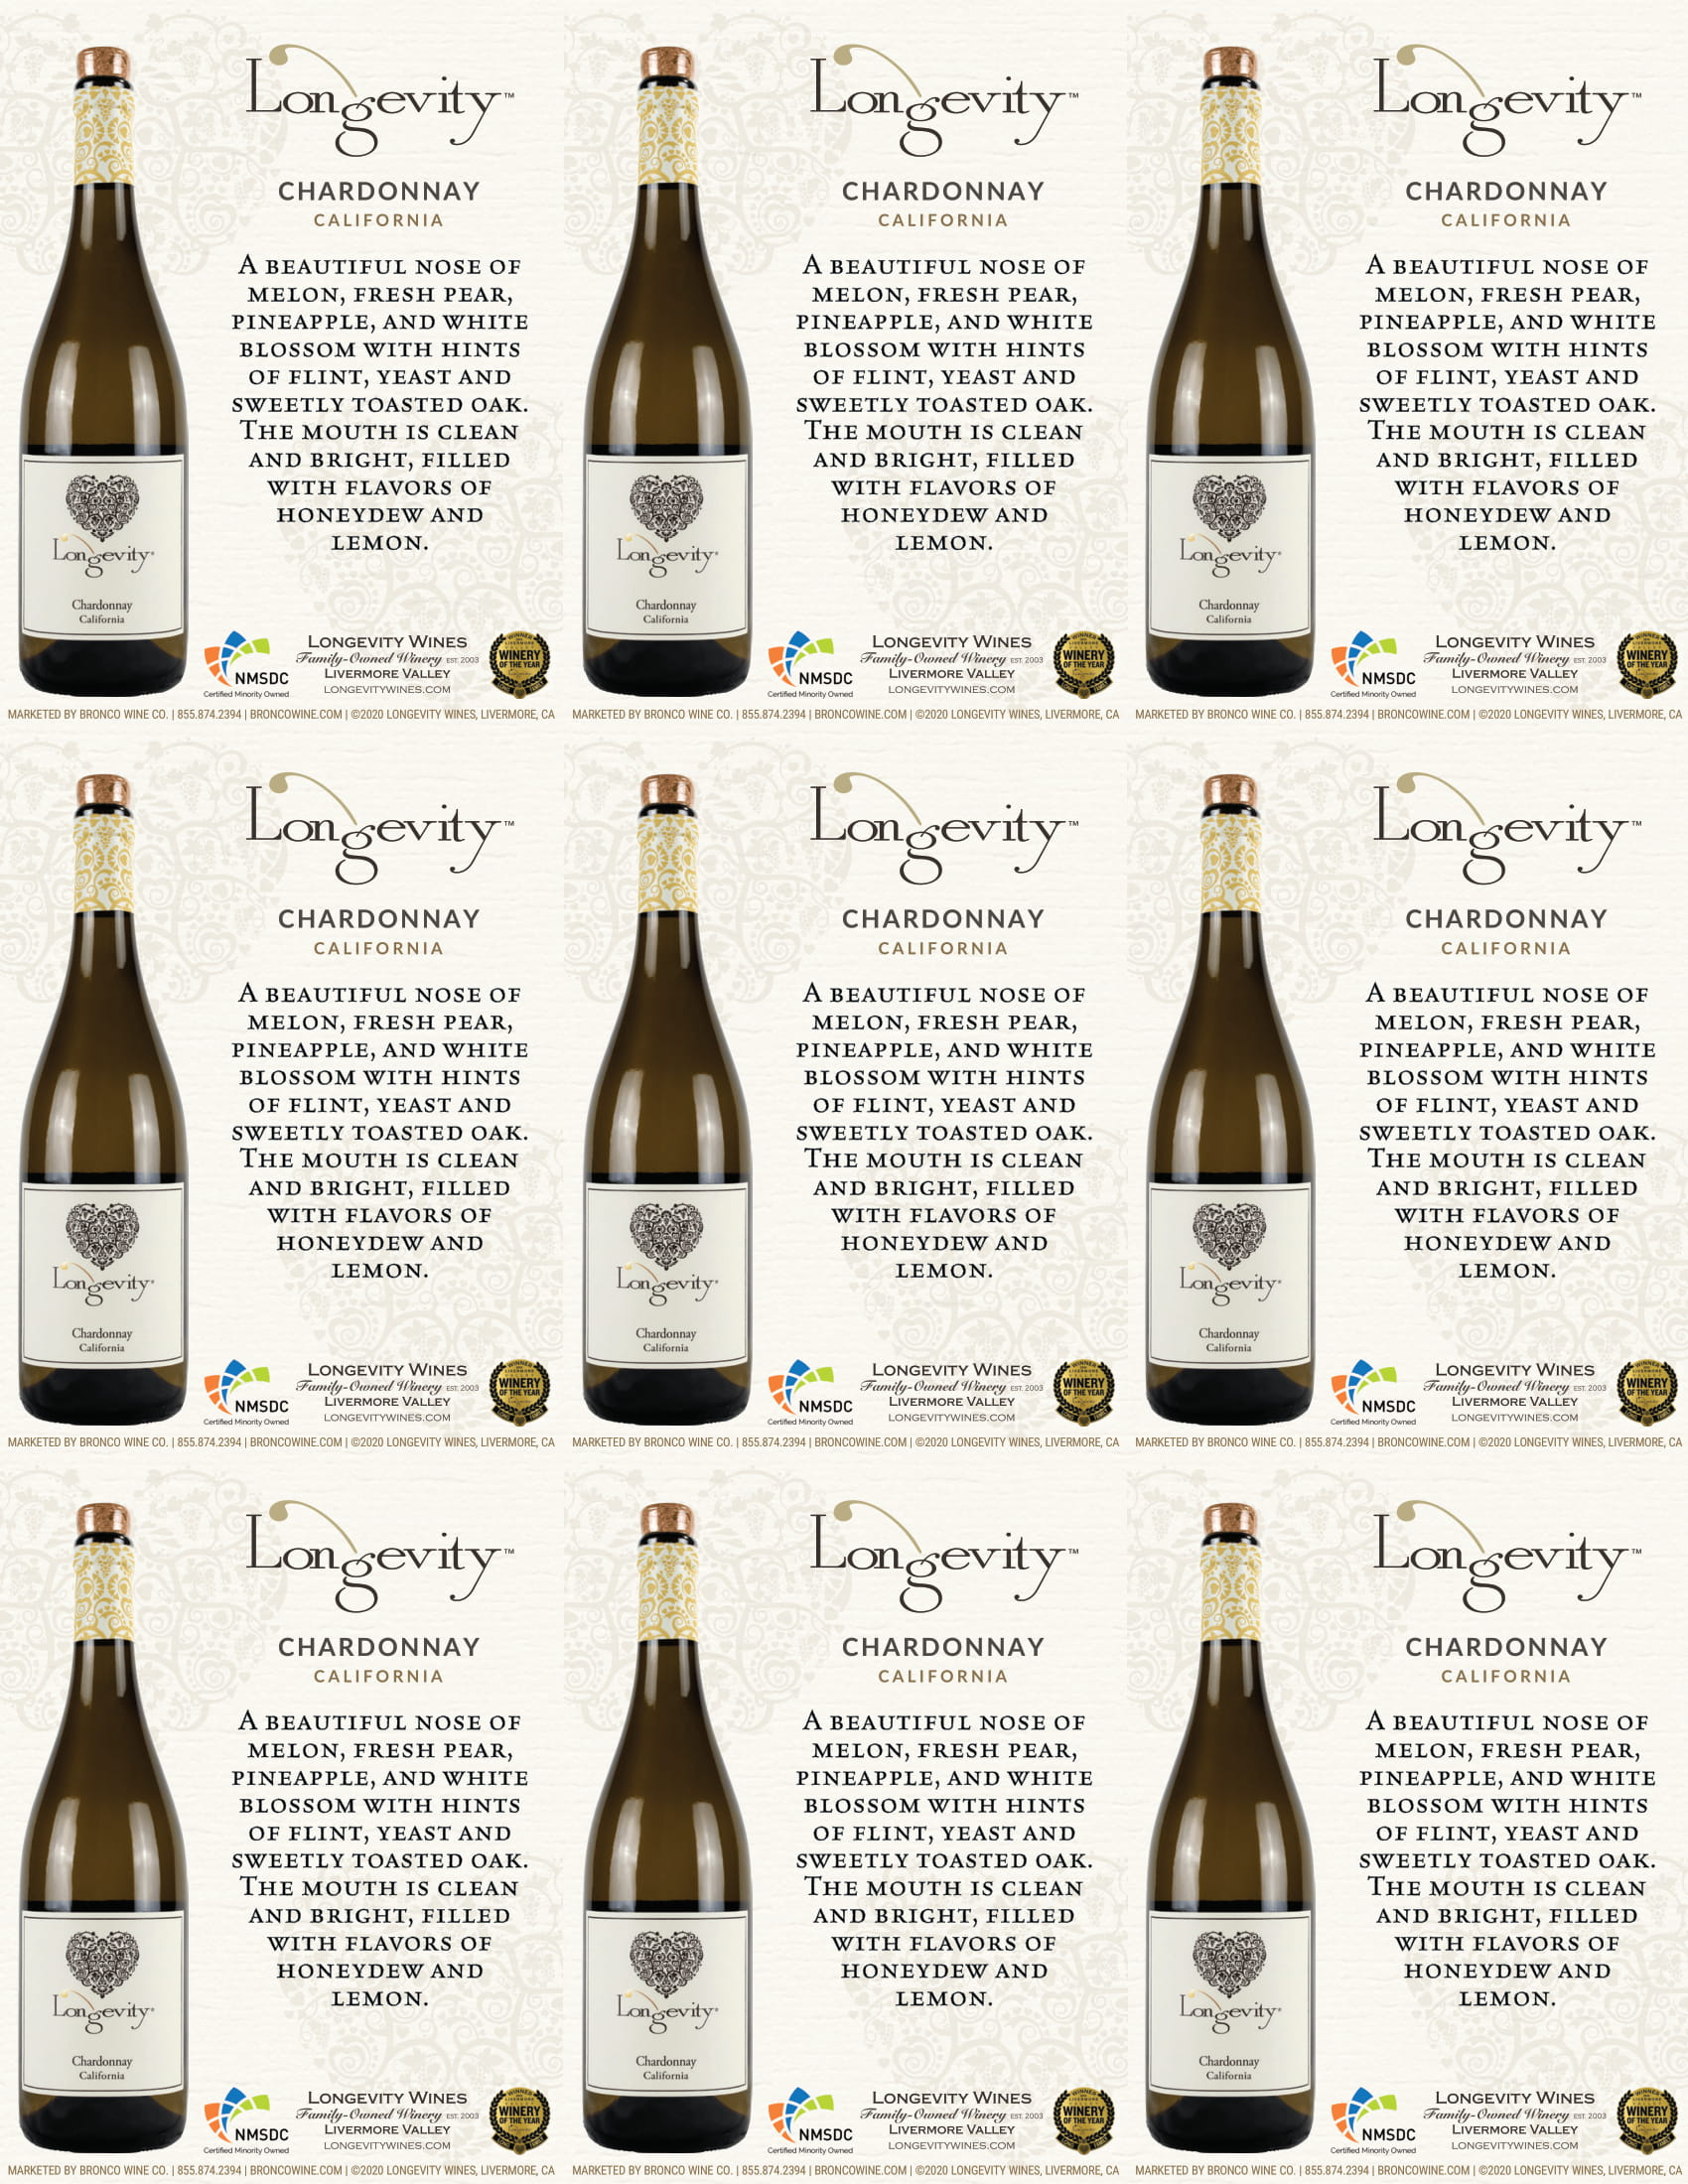 Longevity Chardonnay Shelf Talkers